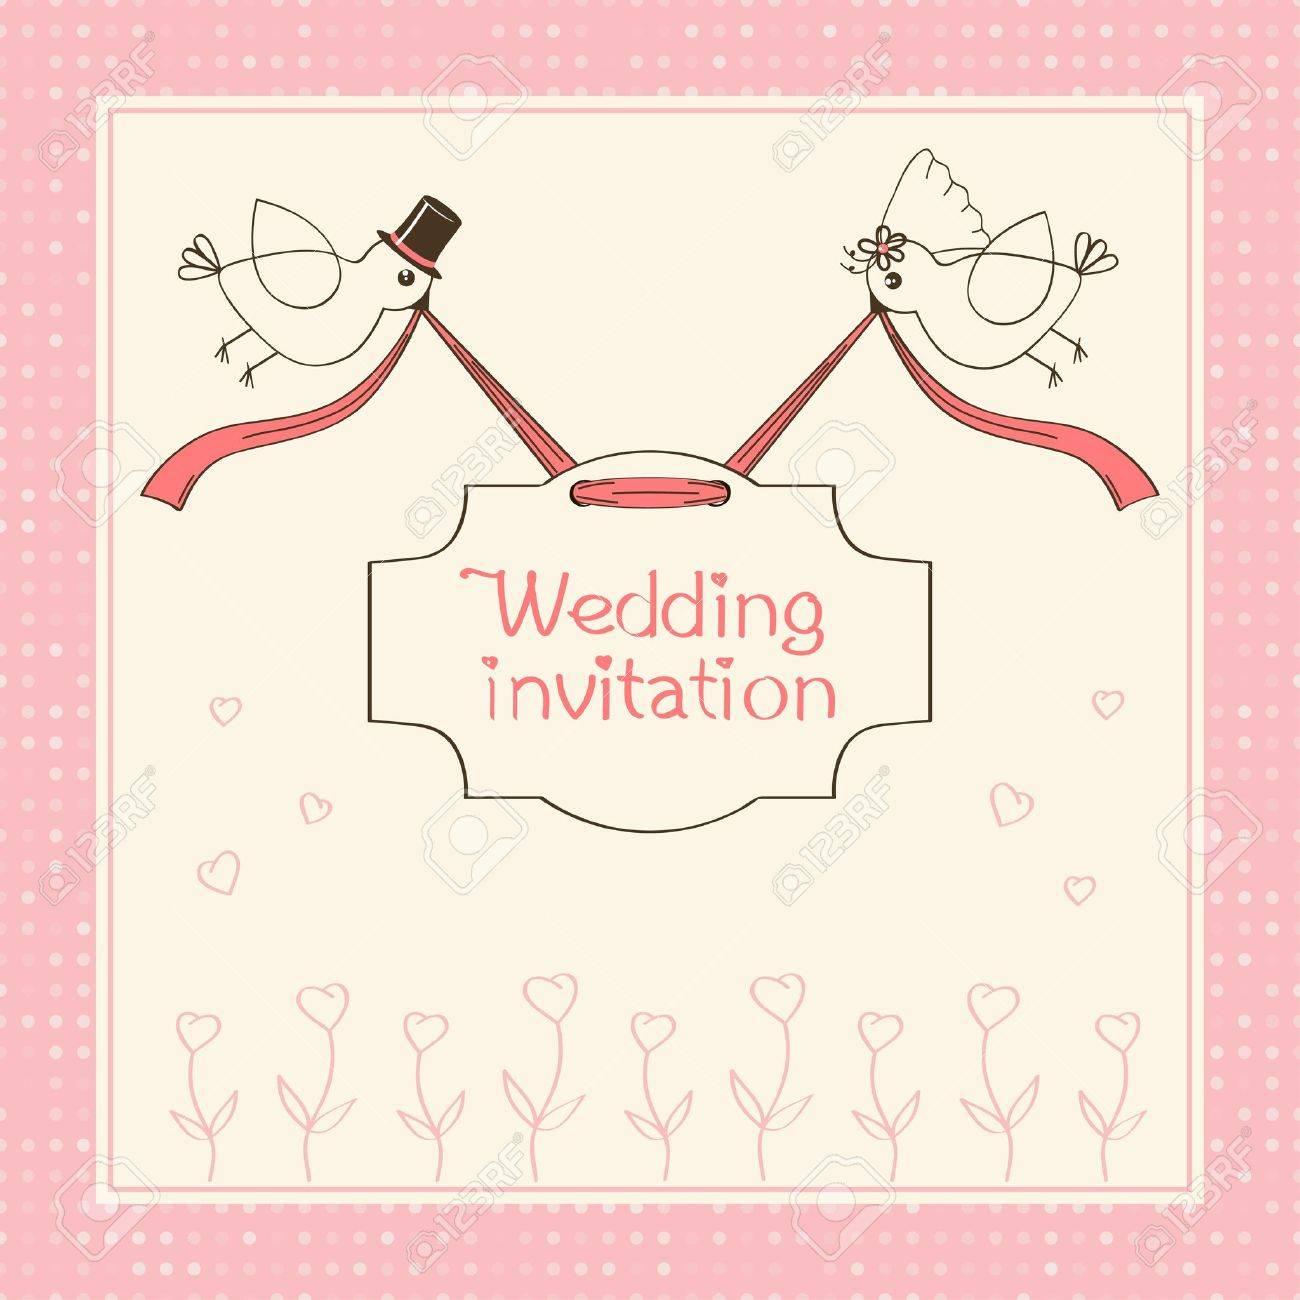 wedding invitation Stock Vector - 19424288